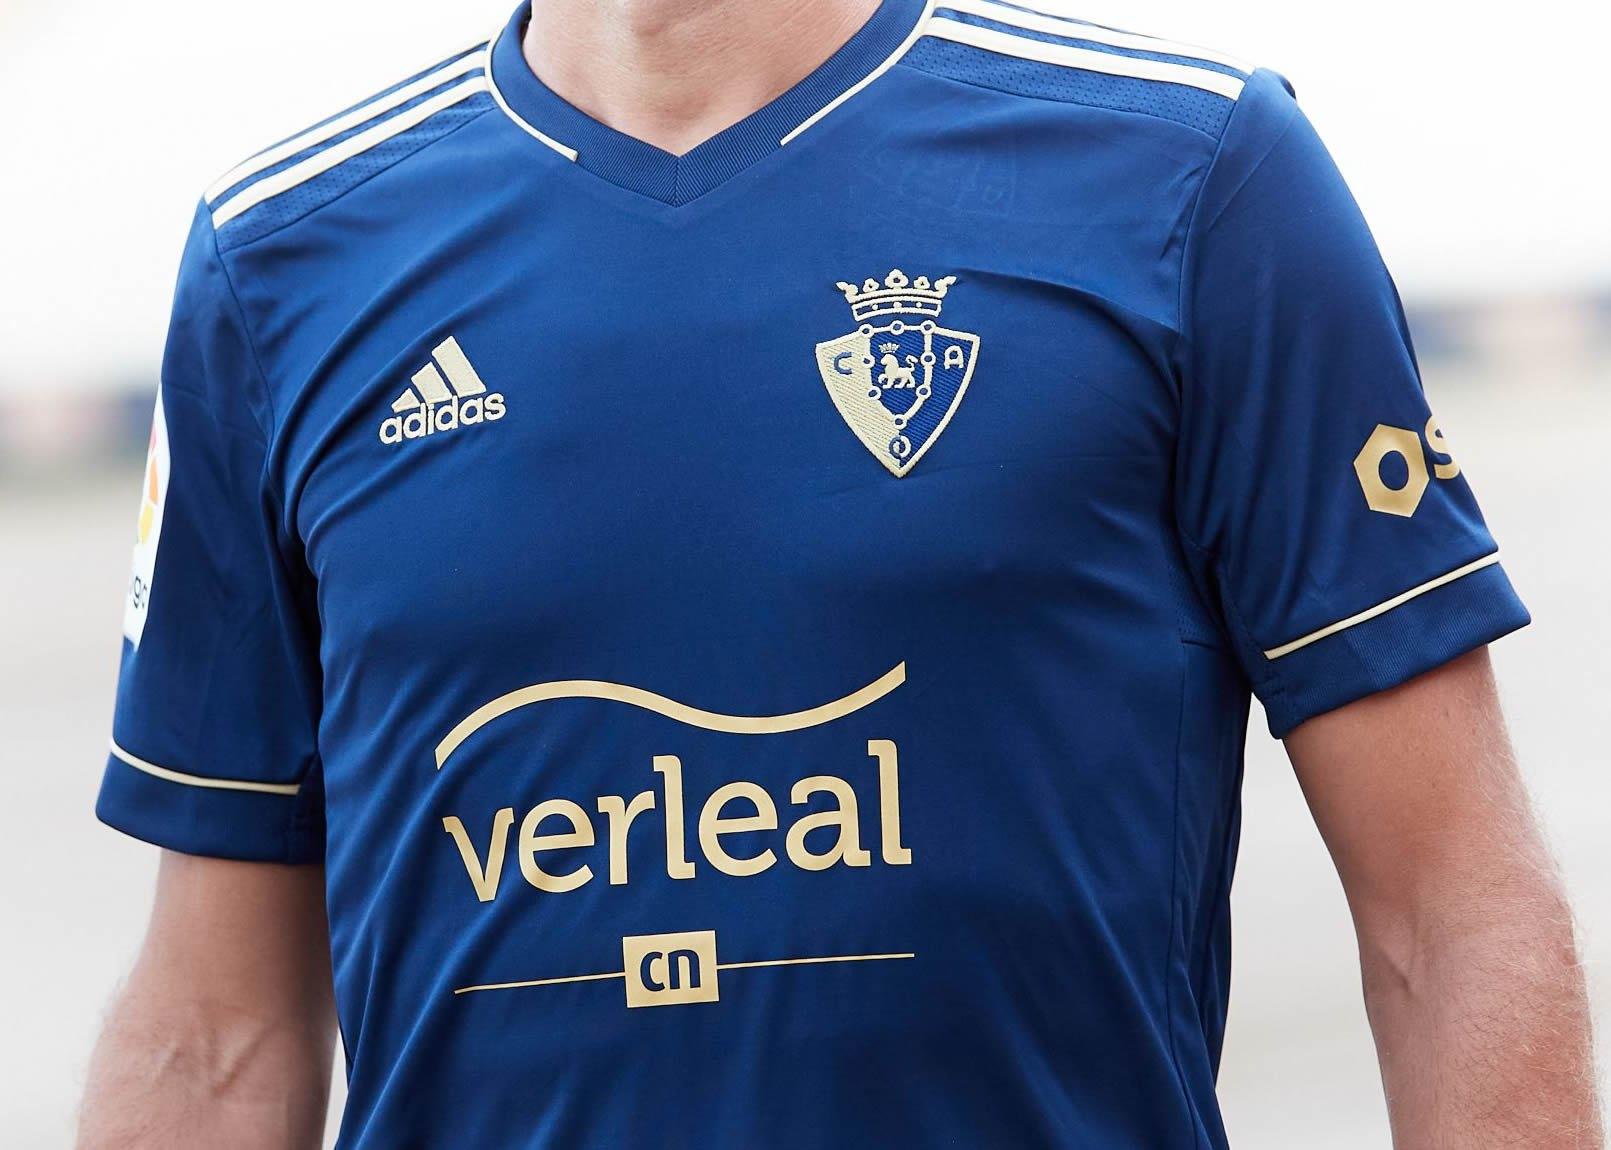 Camisetas adidas del Osasuna 2020/21 | Imagen Twitter Oficial